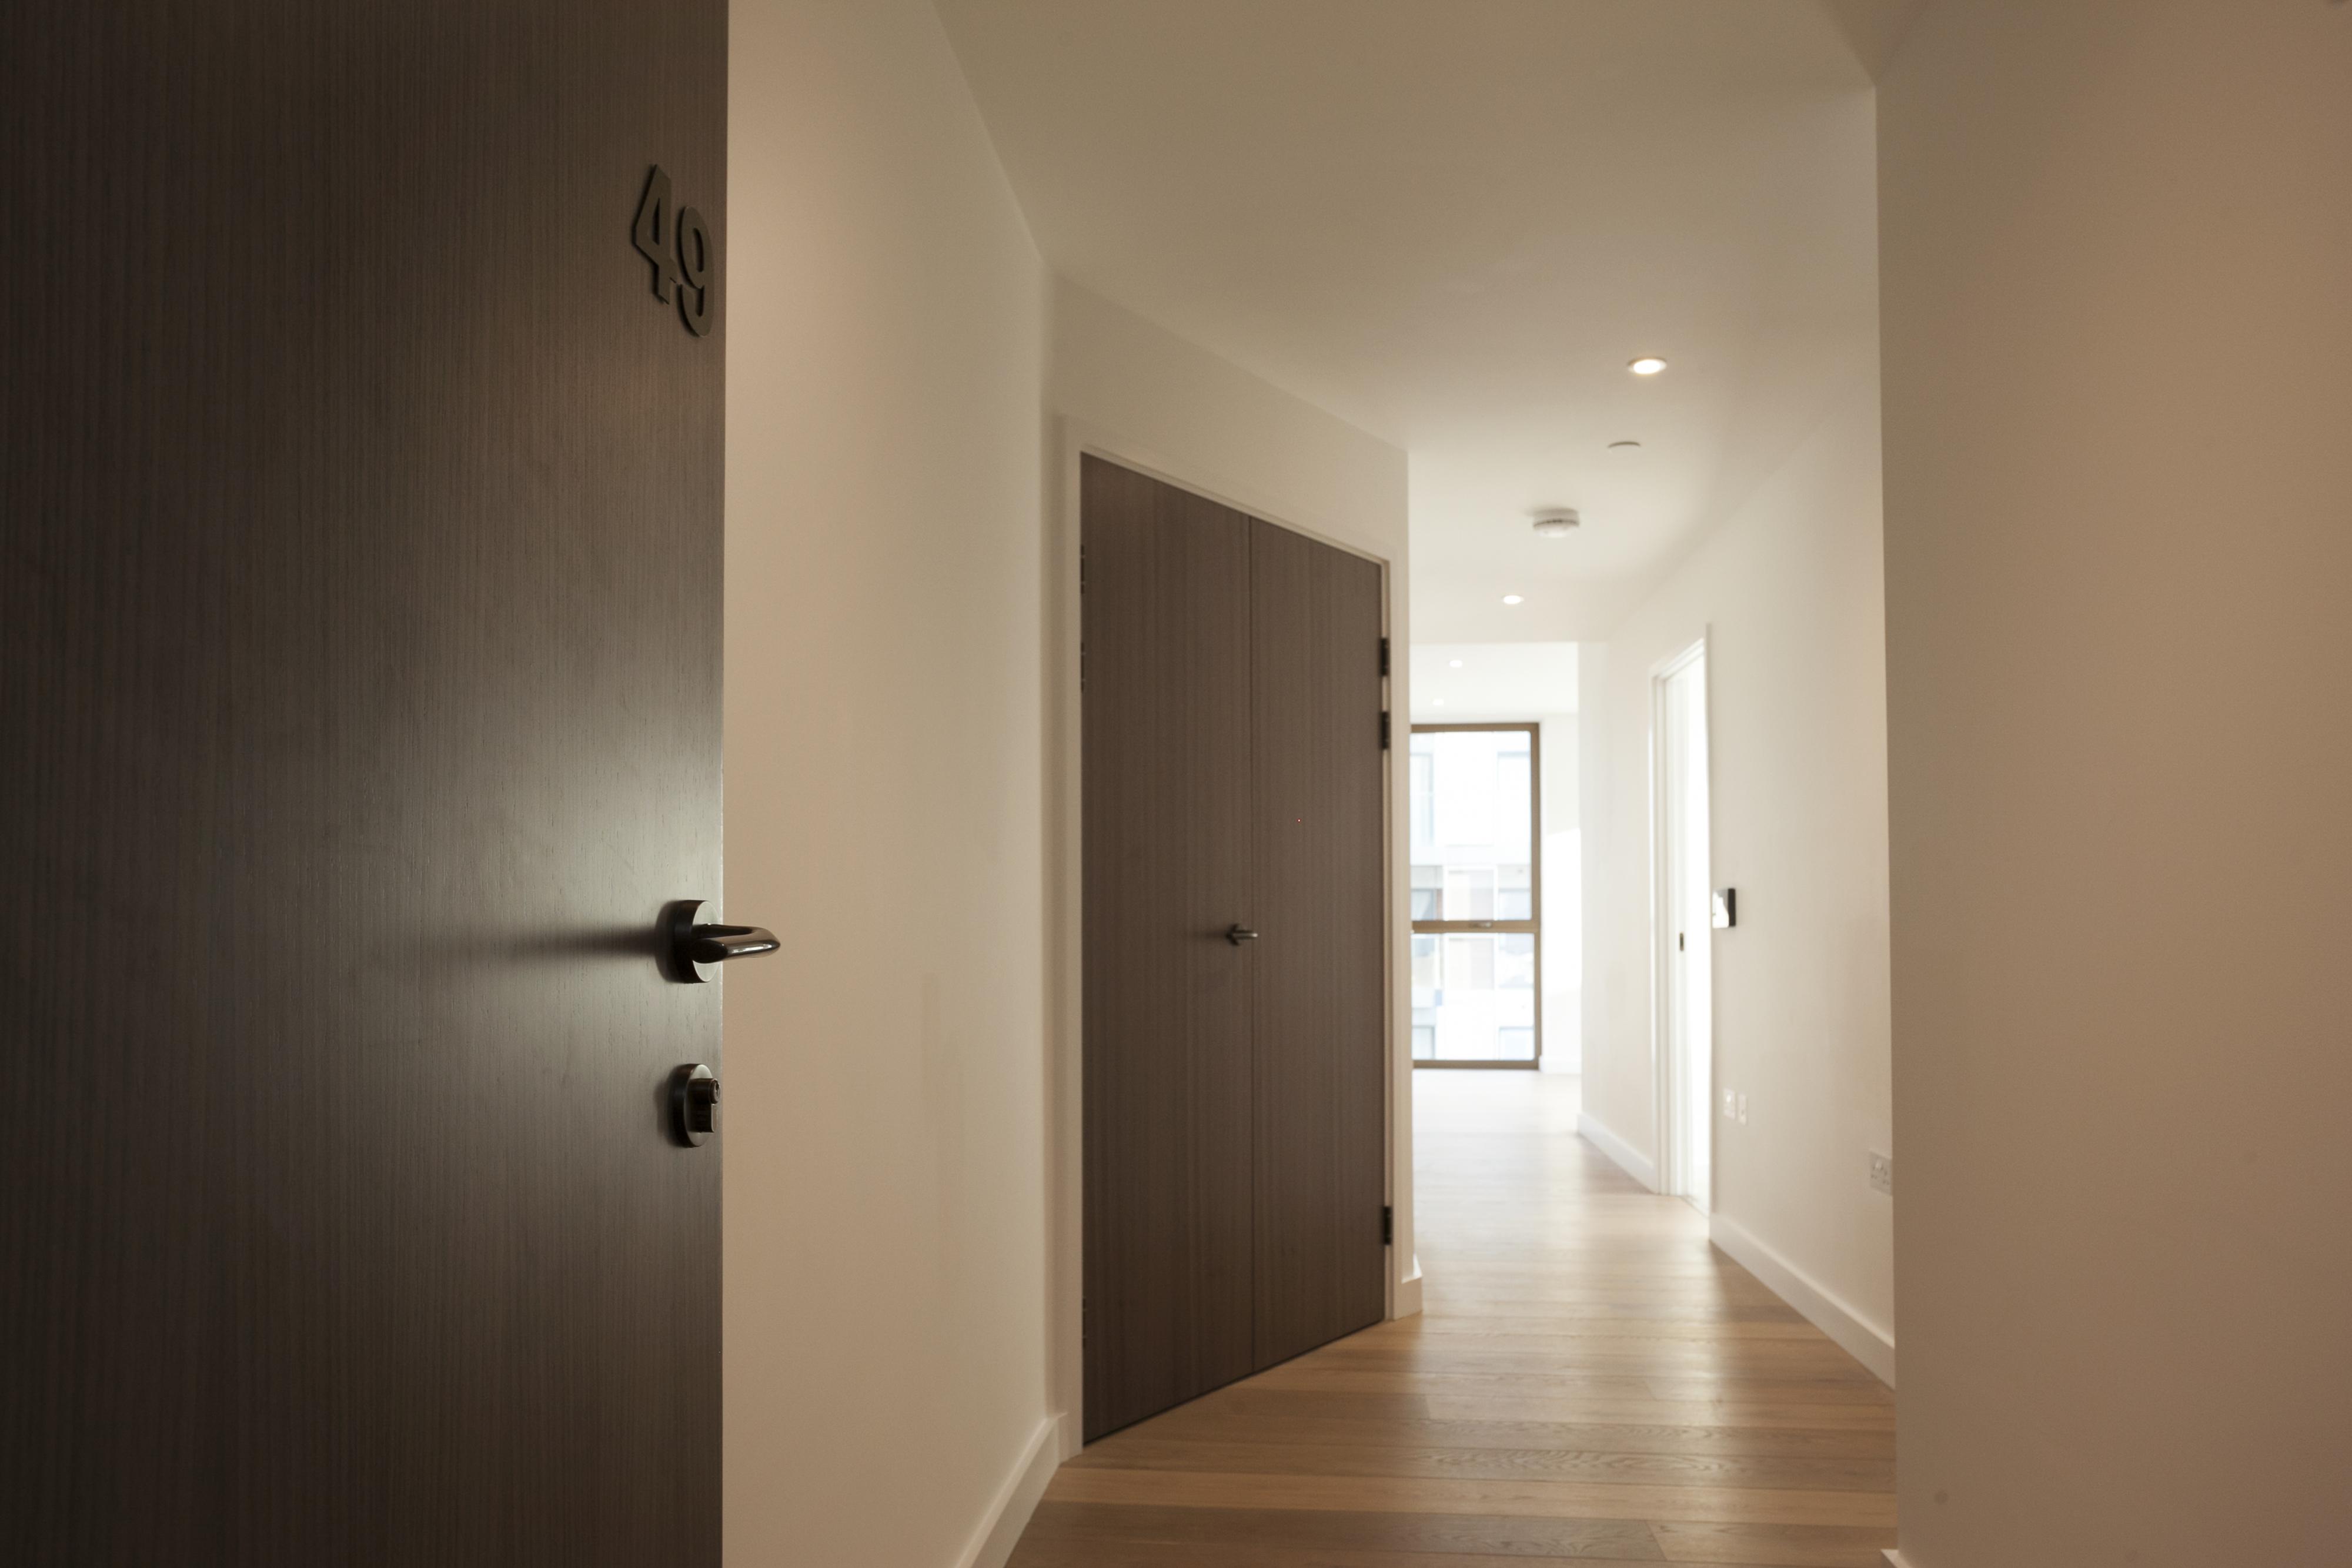 Stained Doors with Integra Living Ironmongery